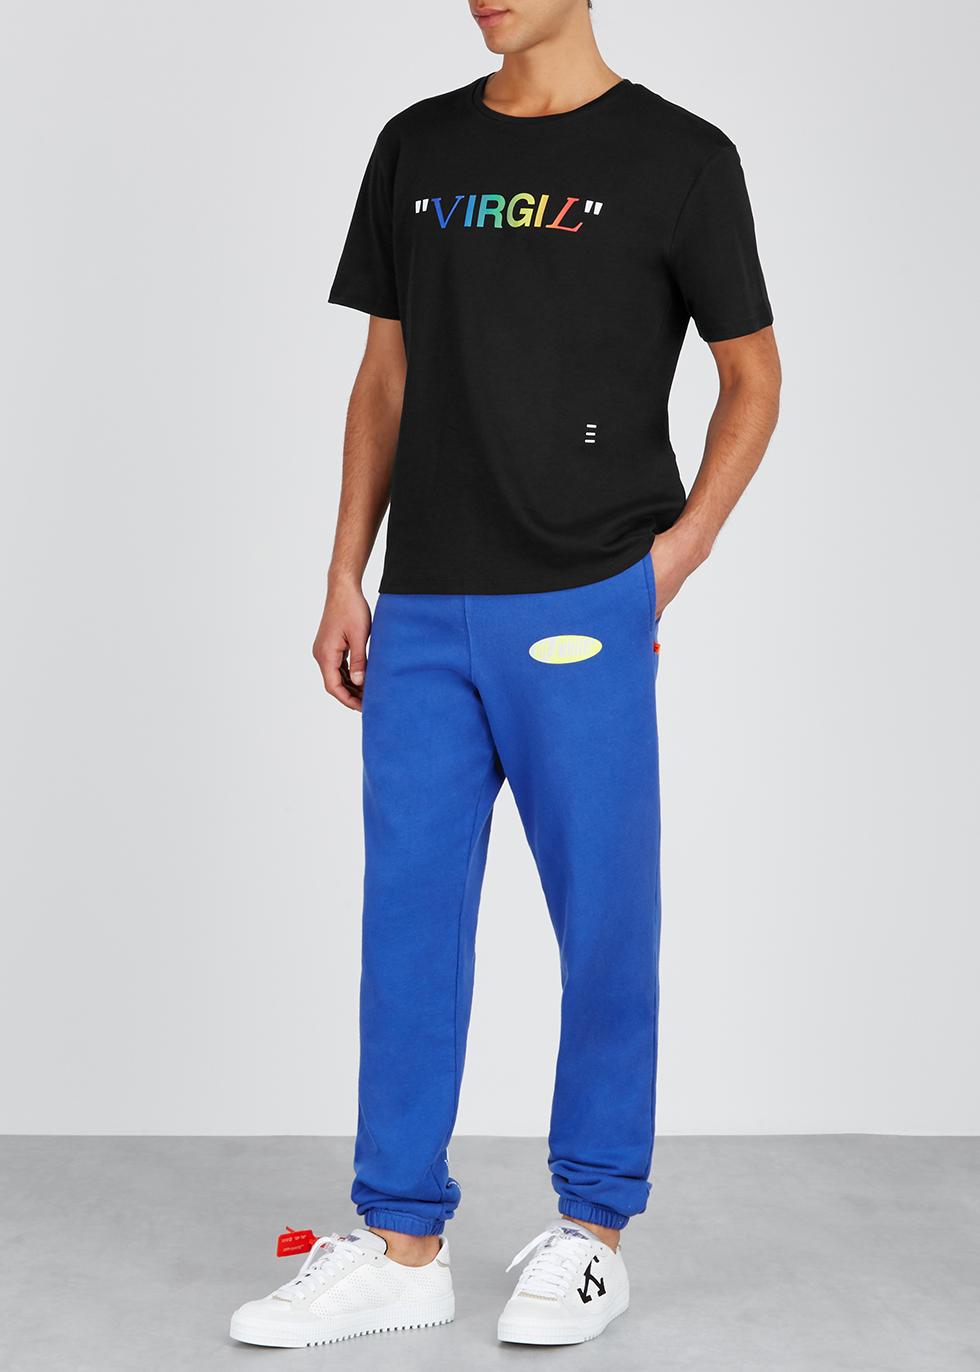 Virgil black cotton T-shirt - Reilly